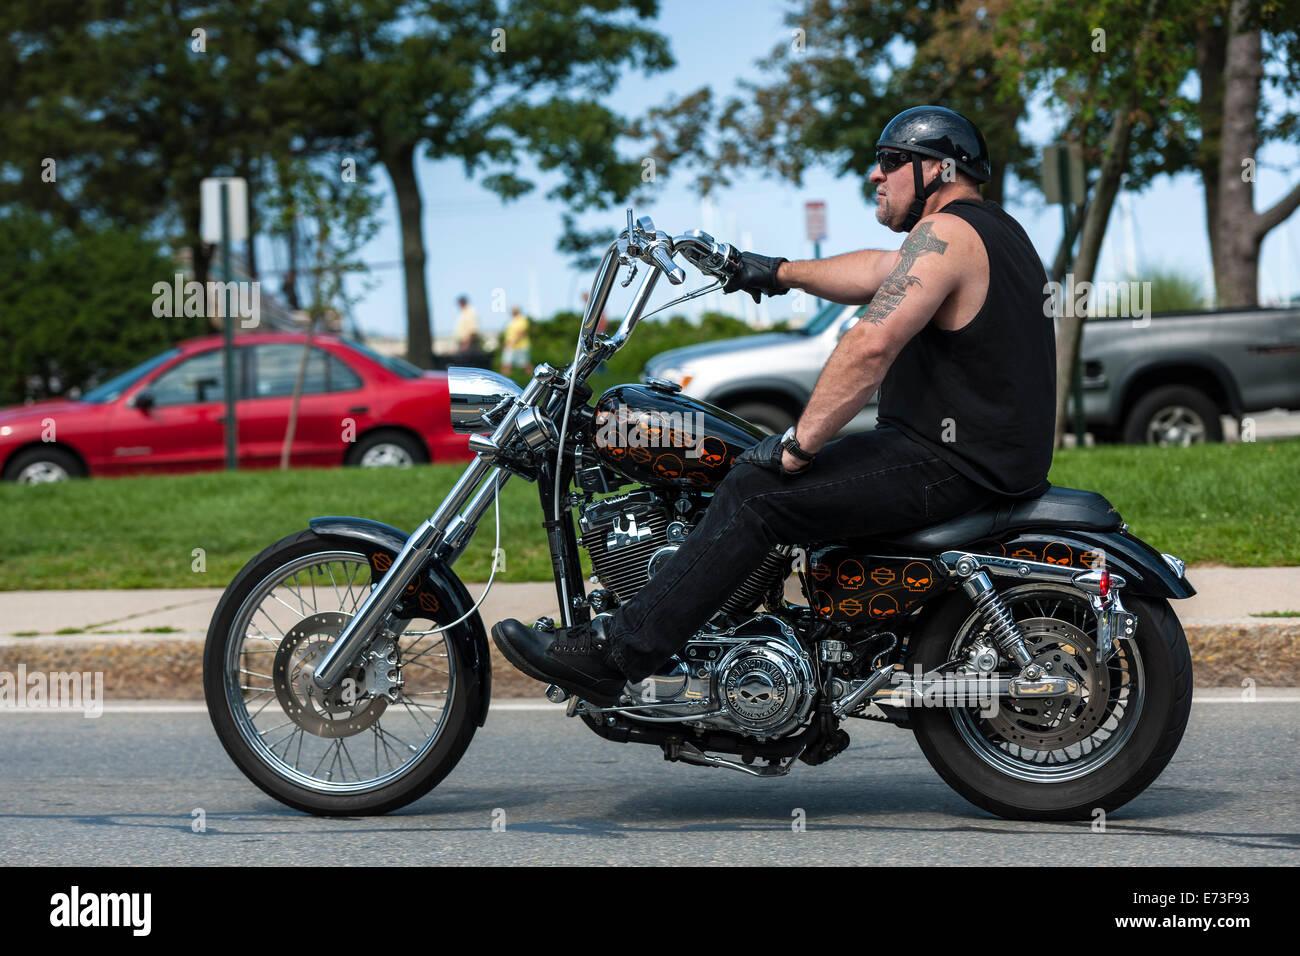 Harley Riders: Harley Davidson Rider Stock Photo: 73221935